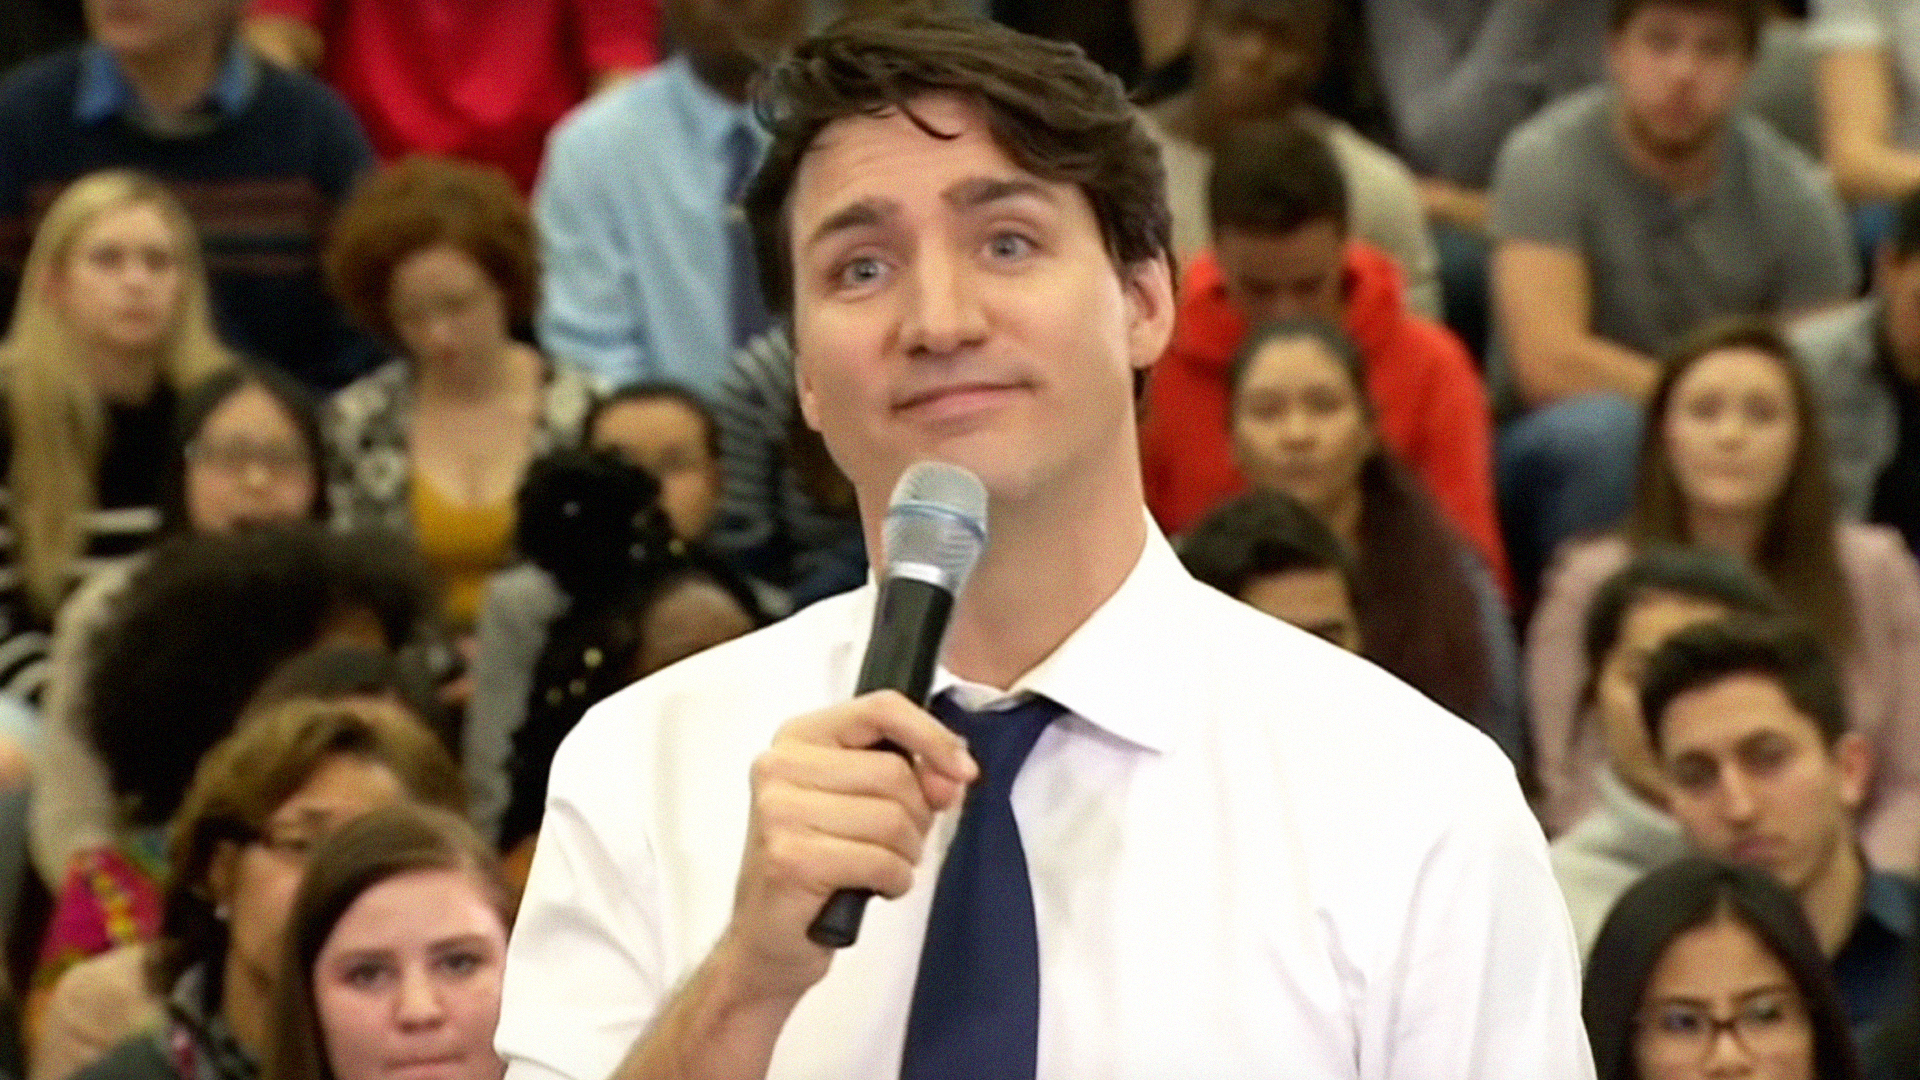 Justin Trudeau Said Peoplekind And Right Wing Media Is Very Upset